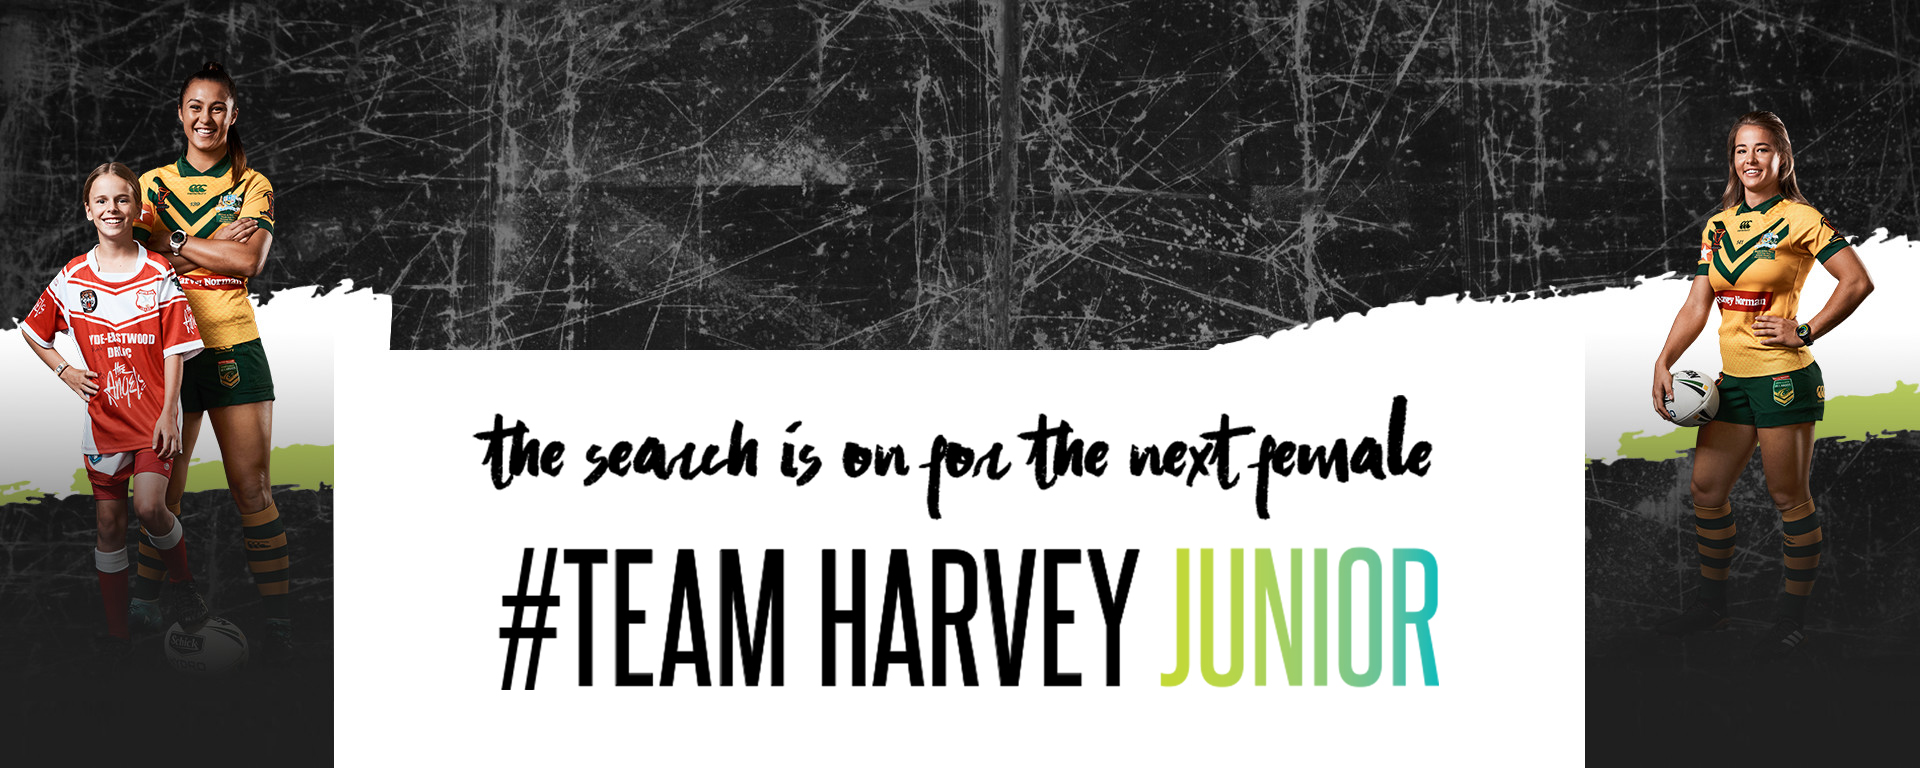 Team Harvey